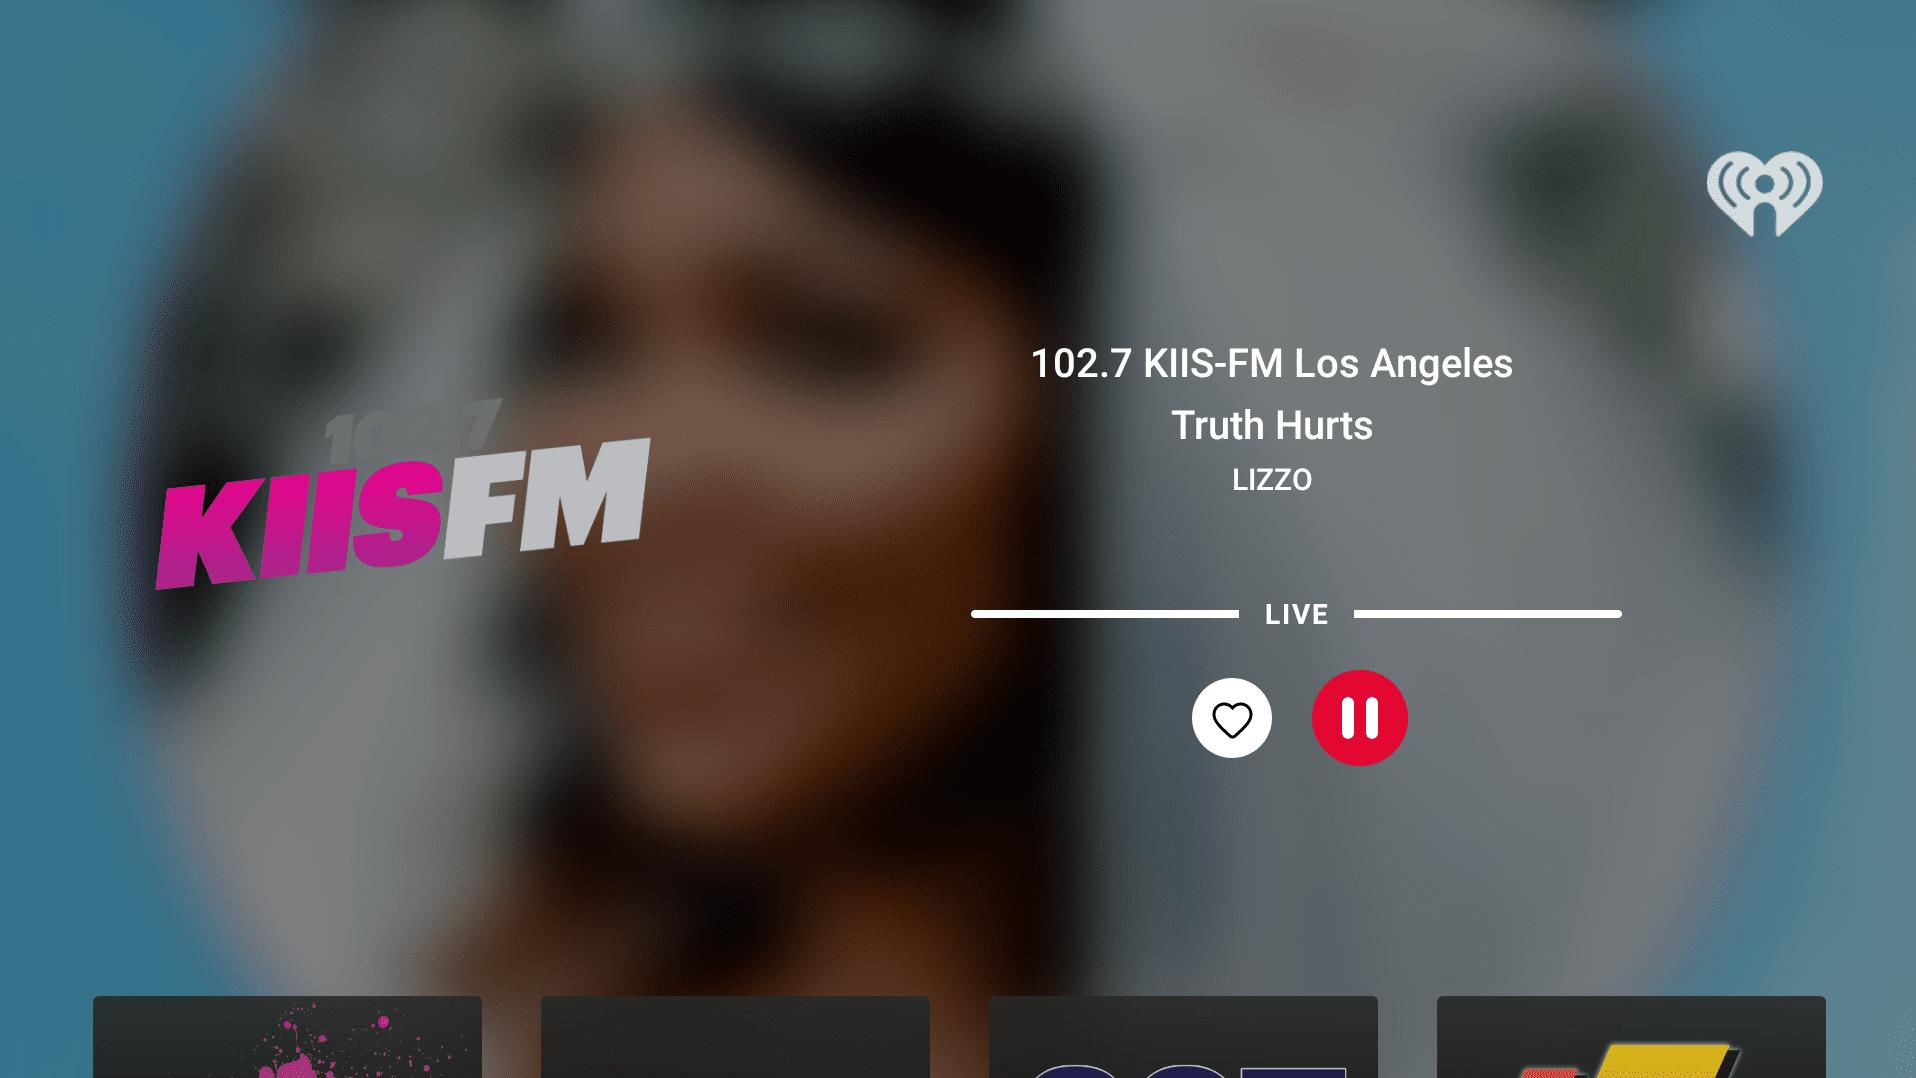 iheartradio app interface